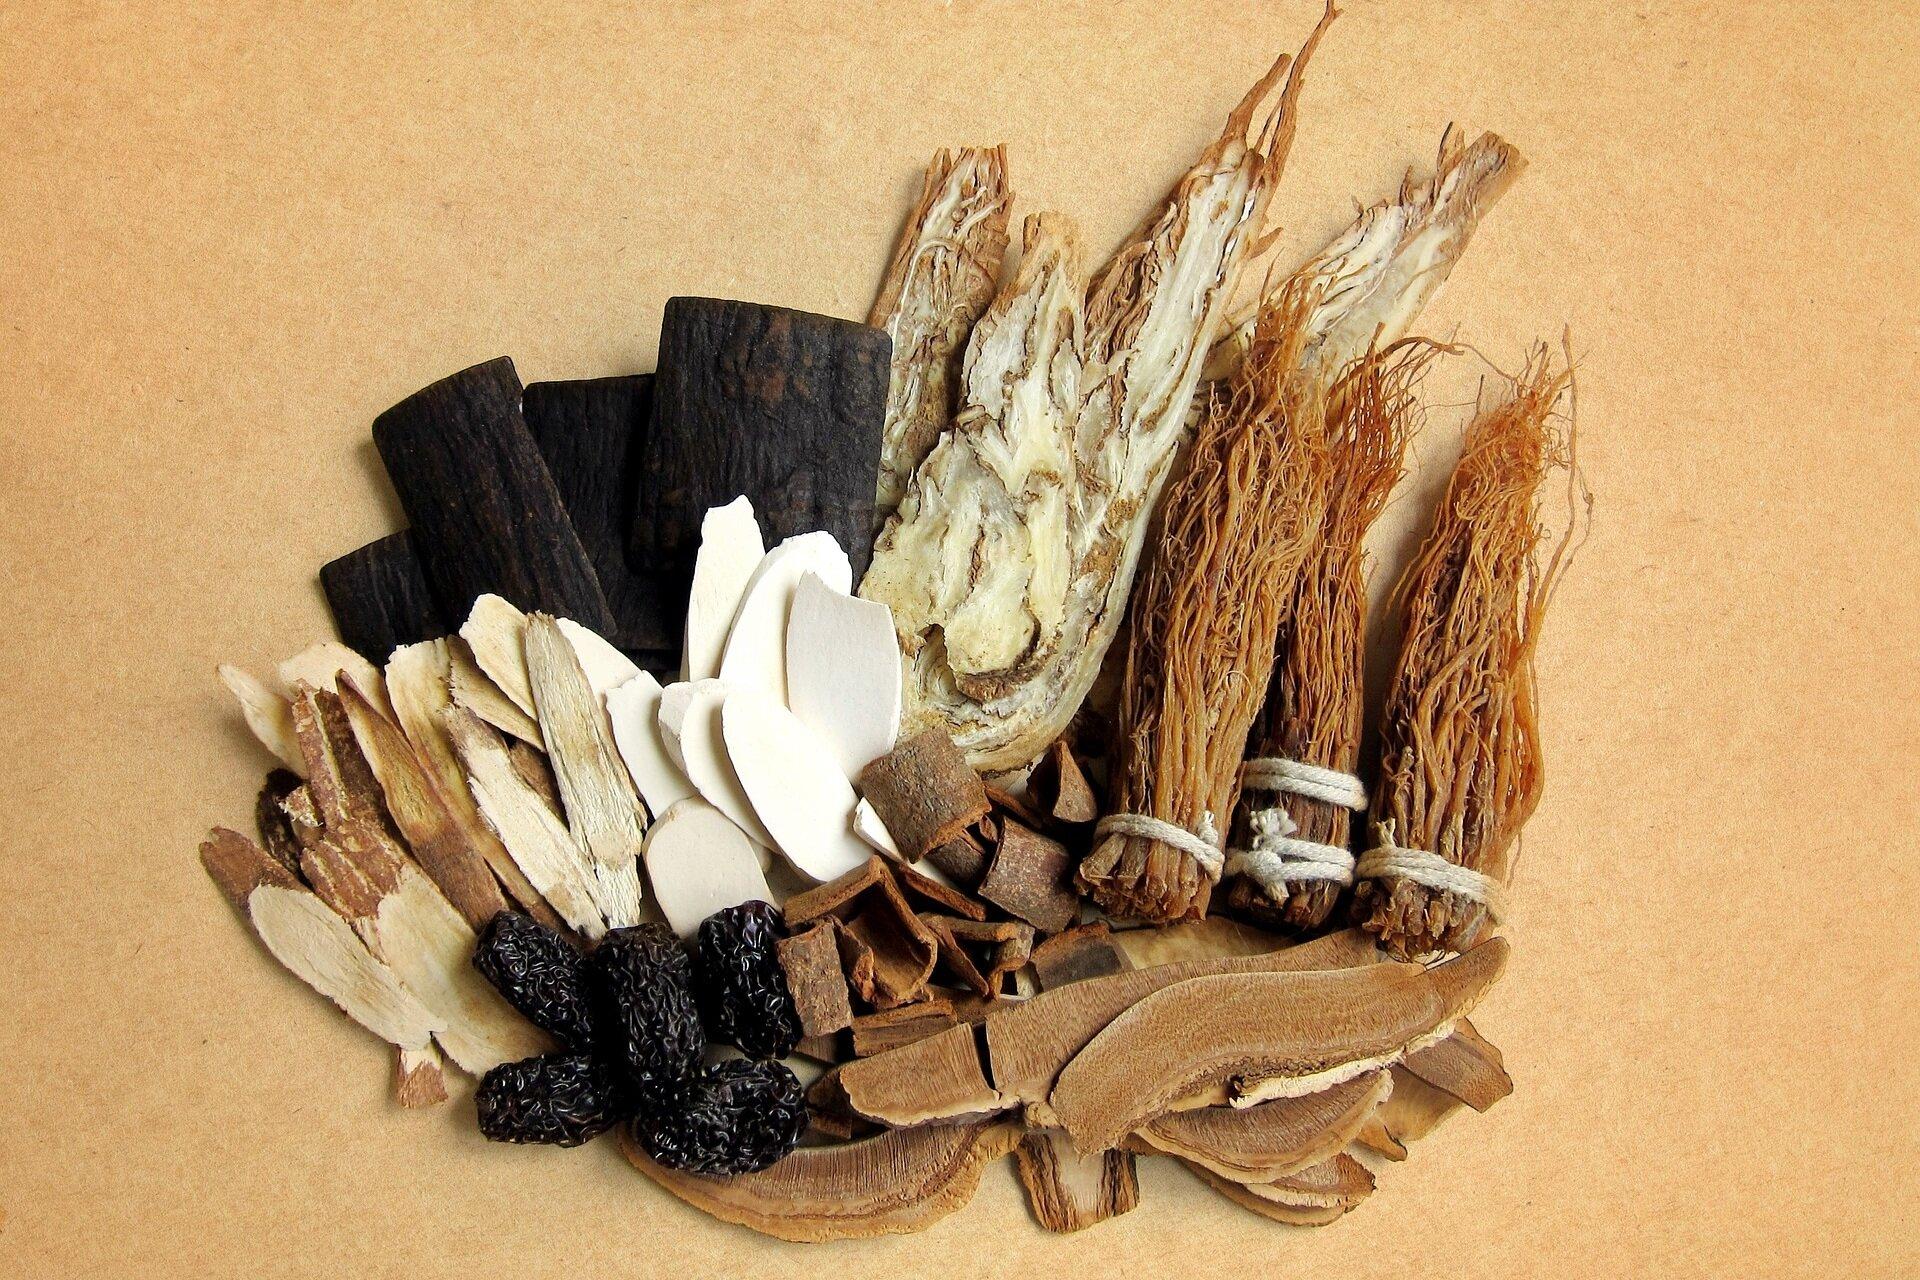 Herbal Remedies - Click here